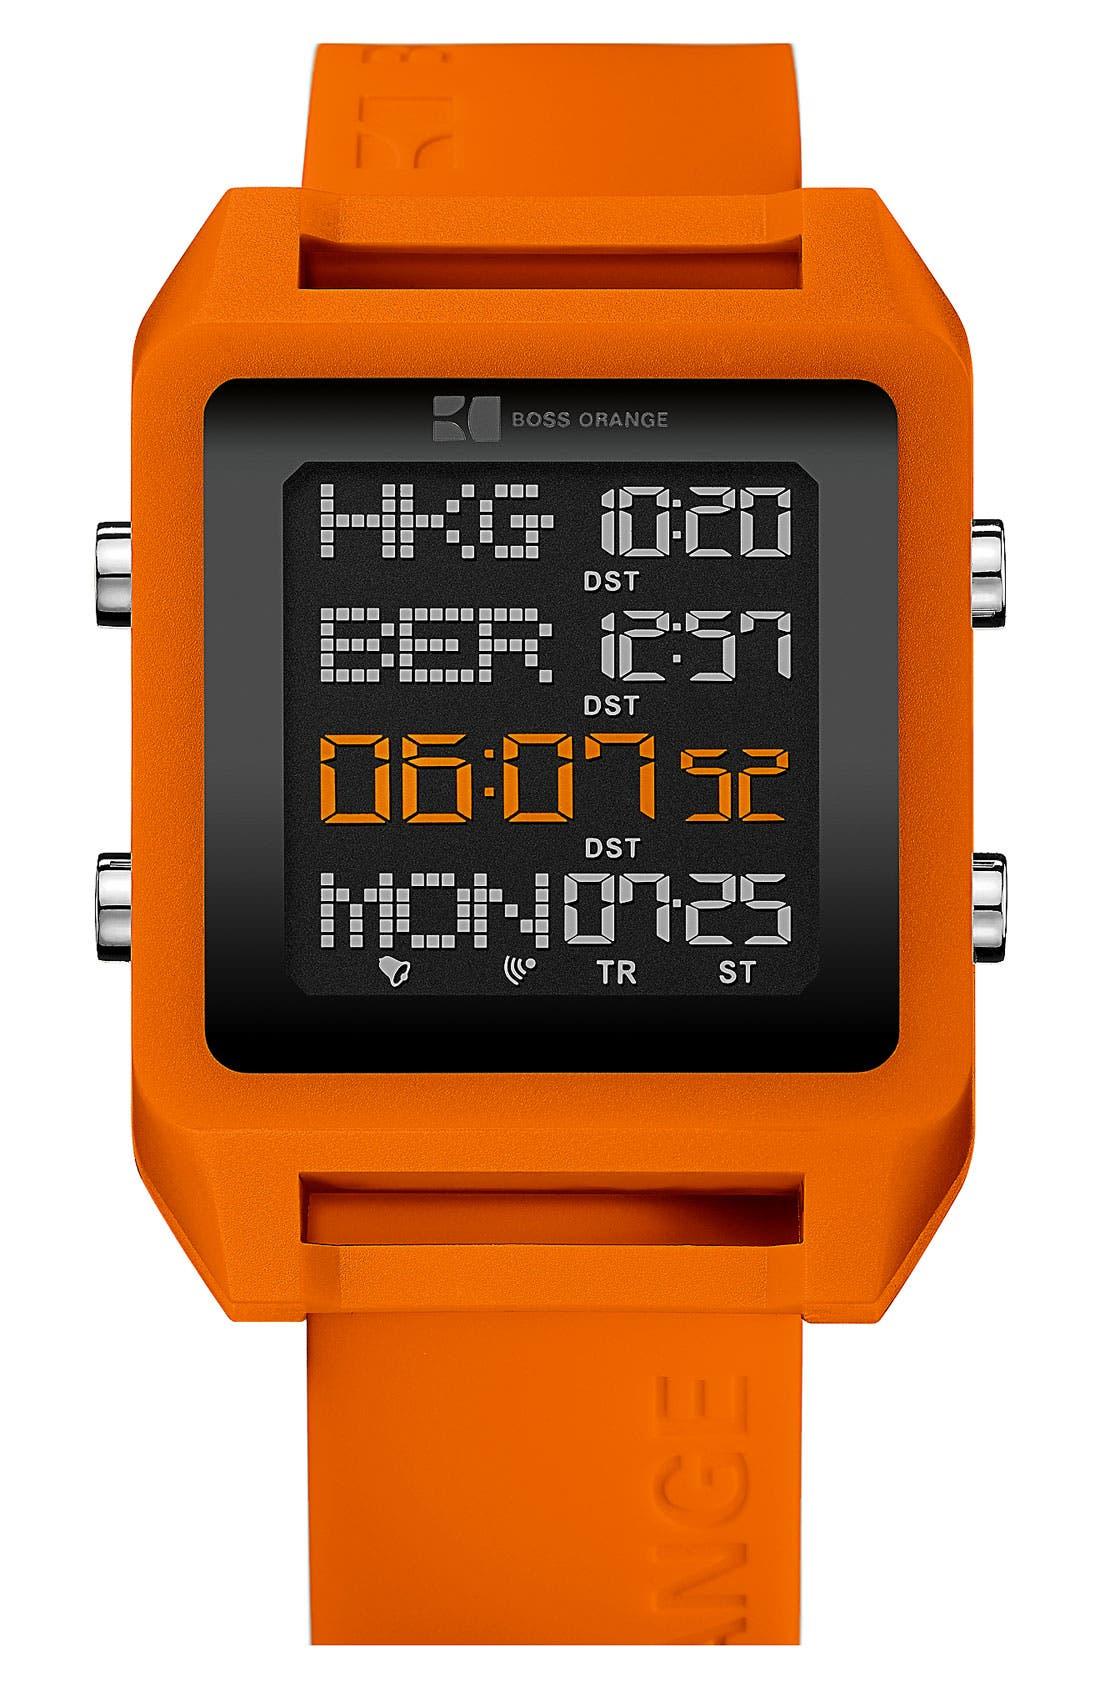 Main Image - BOSS Orange Square Digital Silicone Strap Watch, 40mm x 54mm